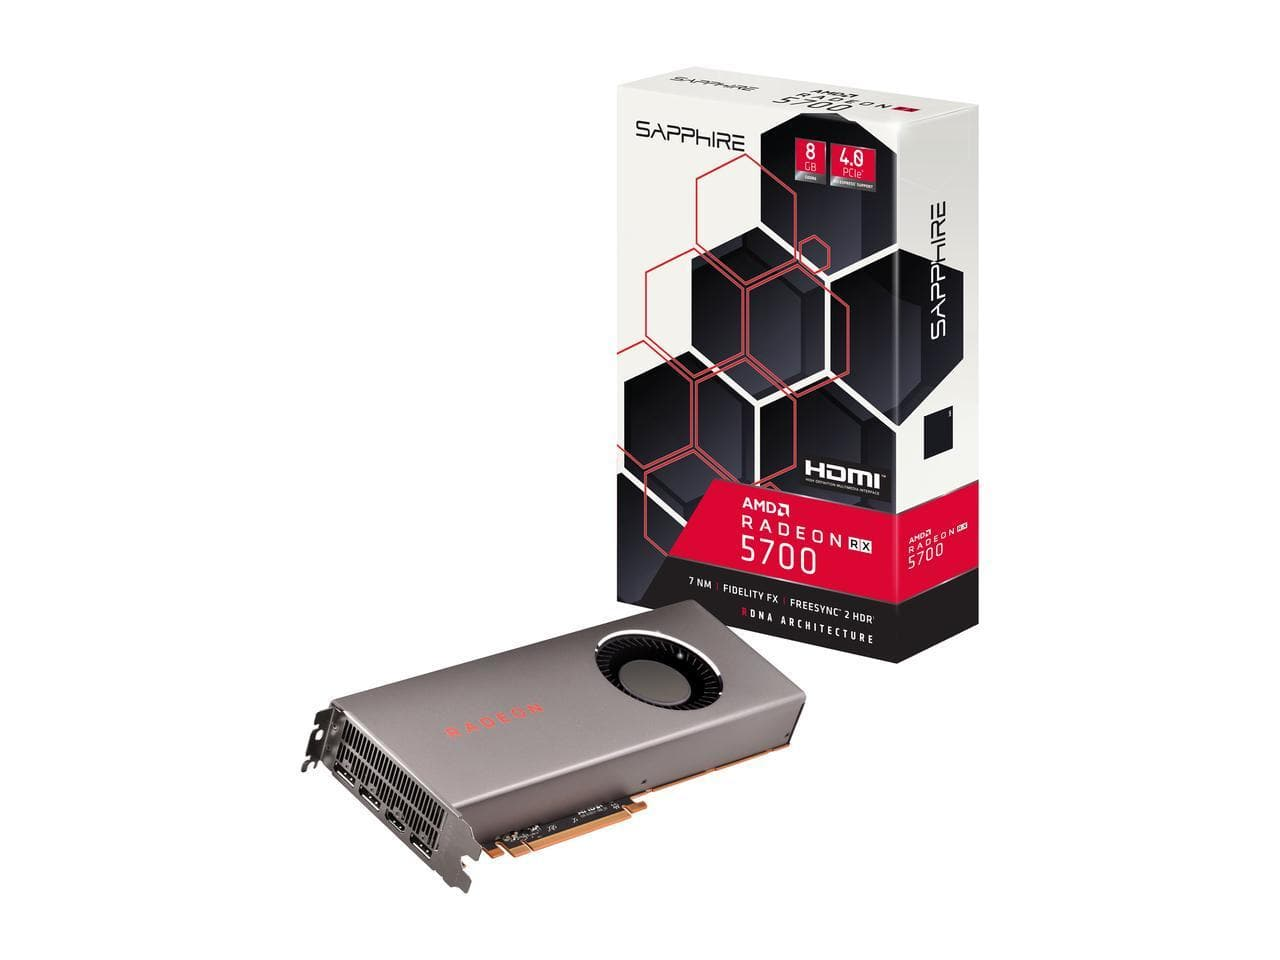 Sapphire Radeon RX 5700 8GB GDDR6 Graphics Card + 3-Months